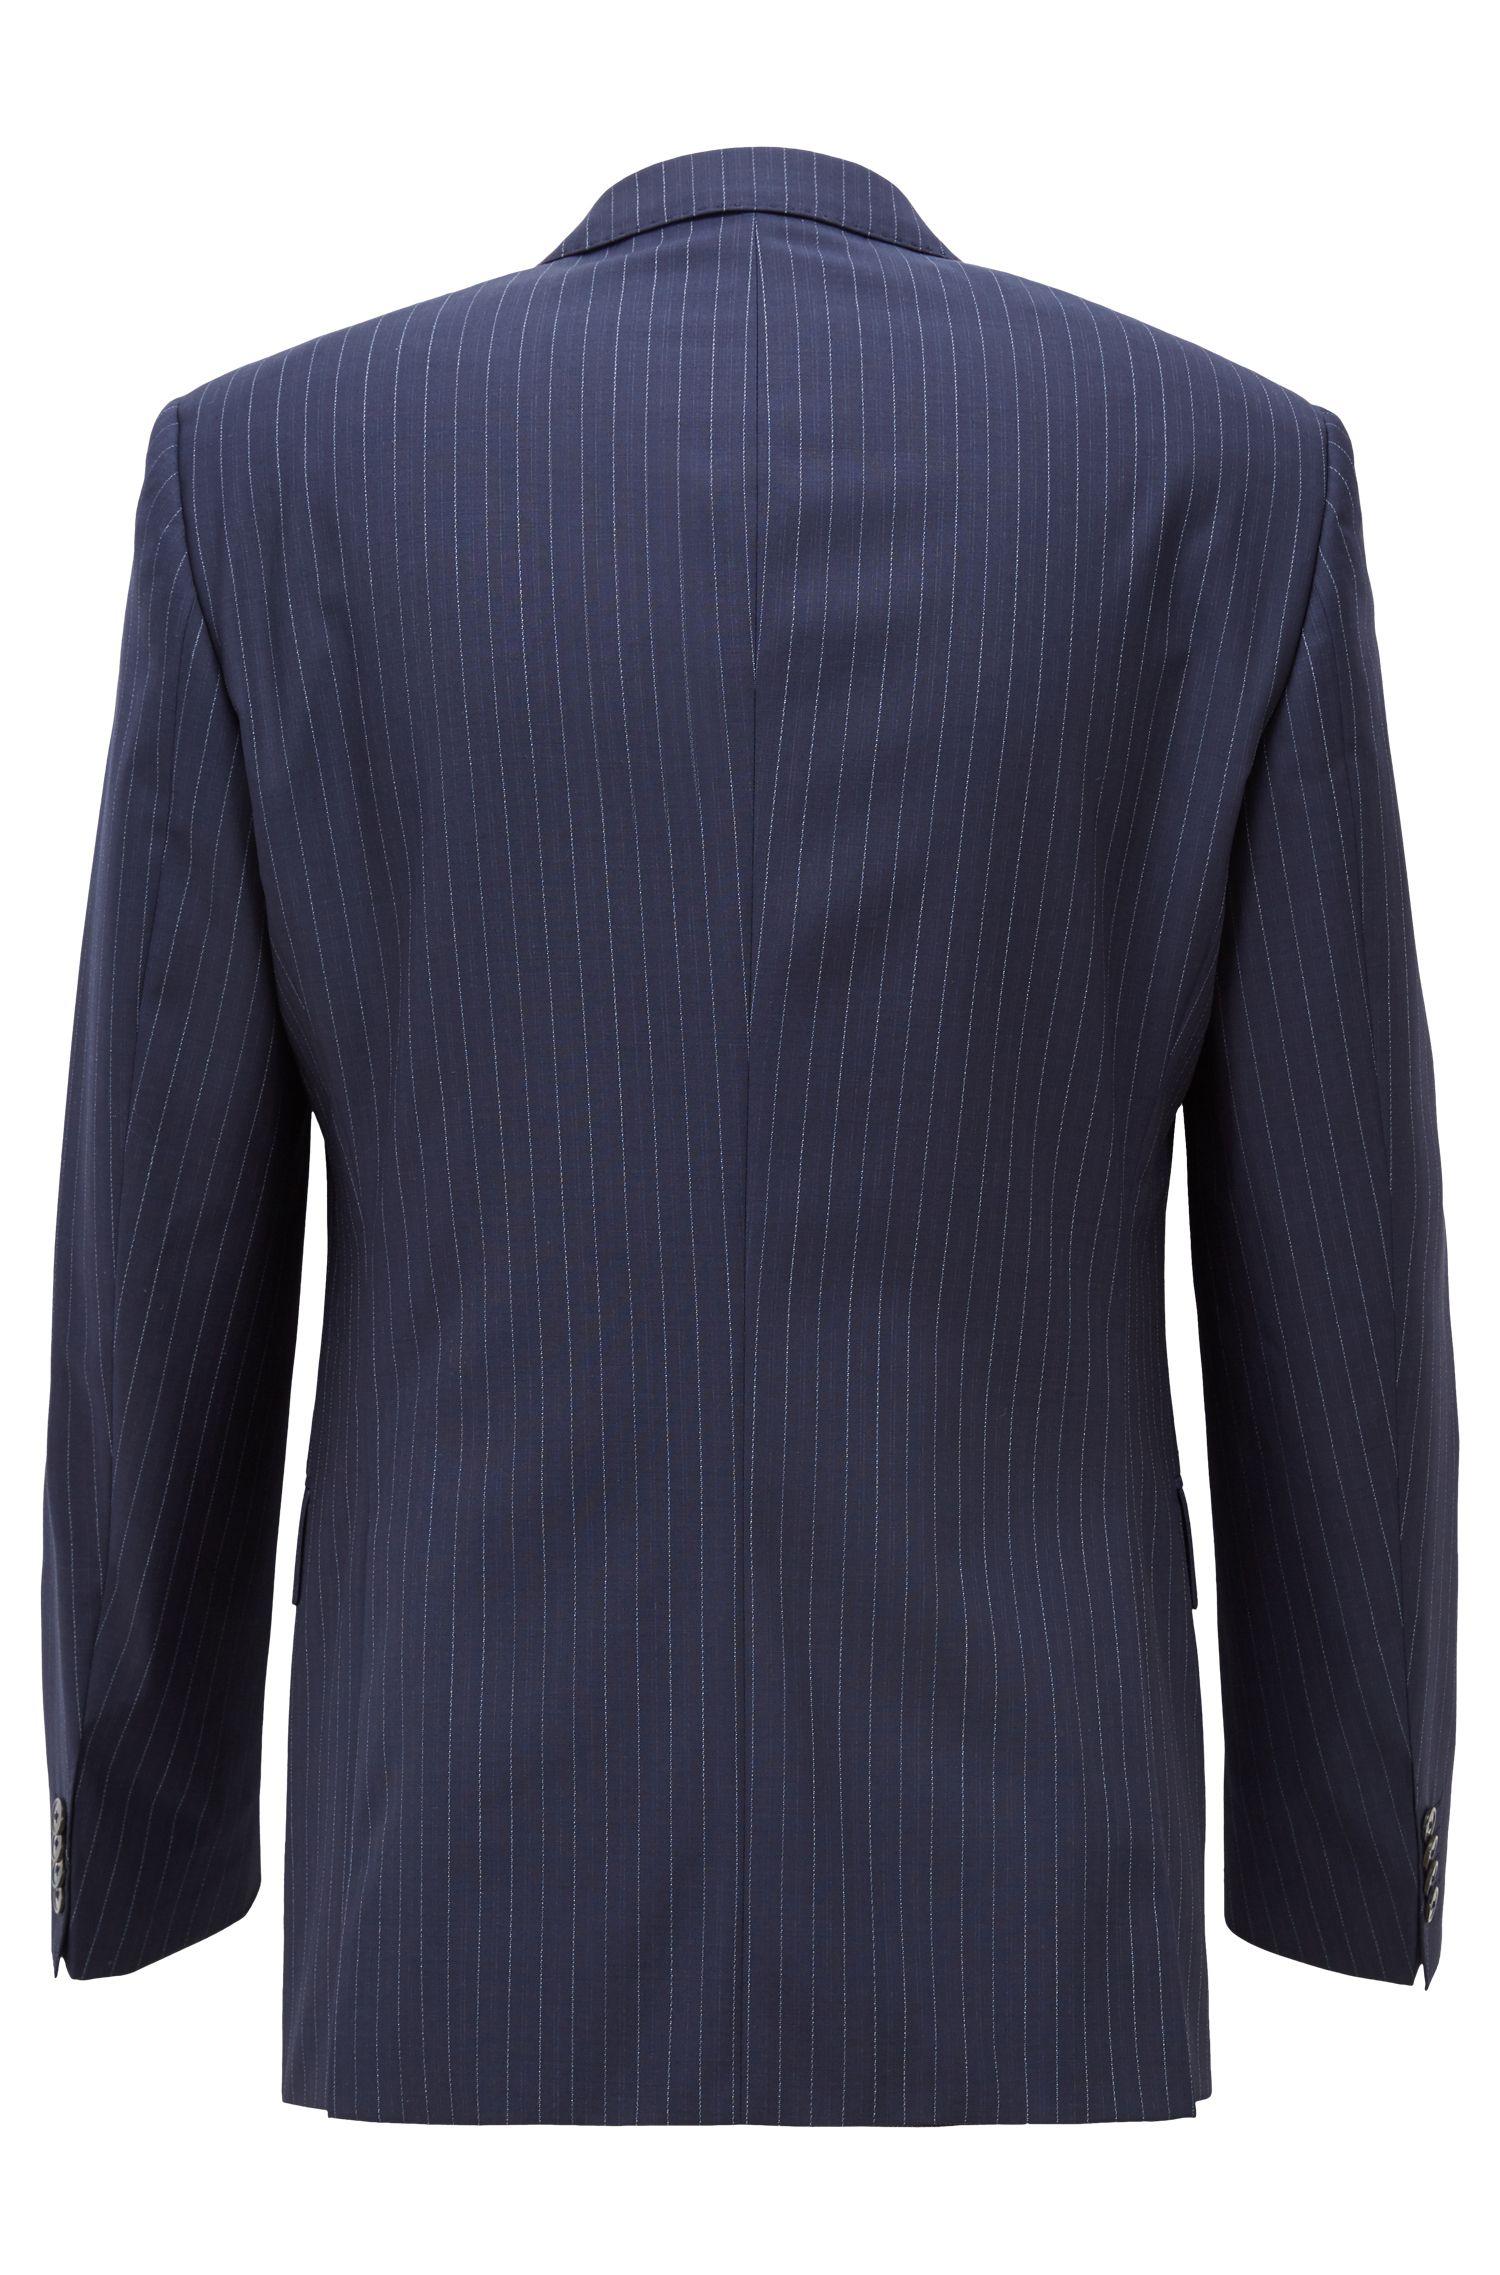 Traje slim fit en lana virgen con raya vertical